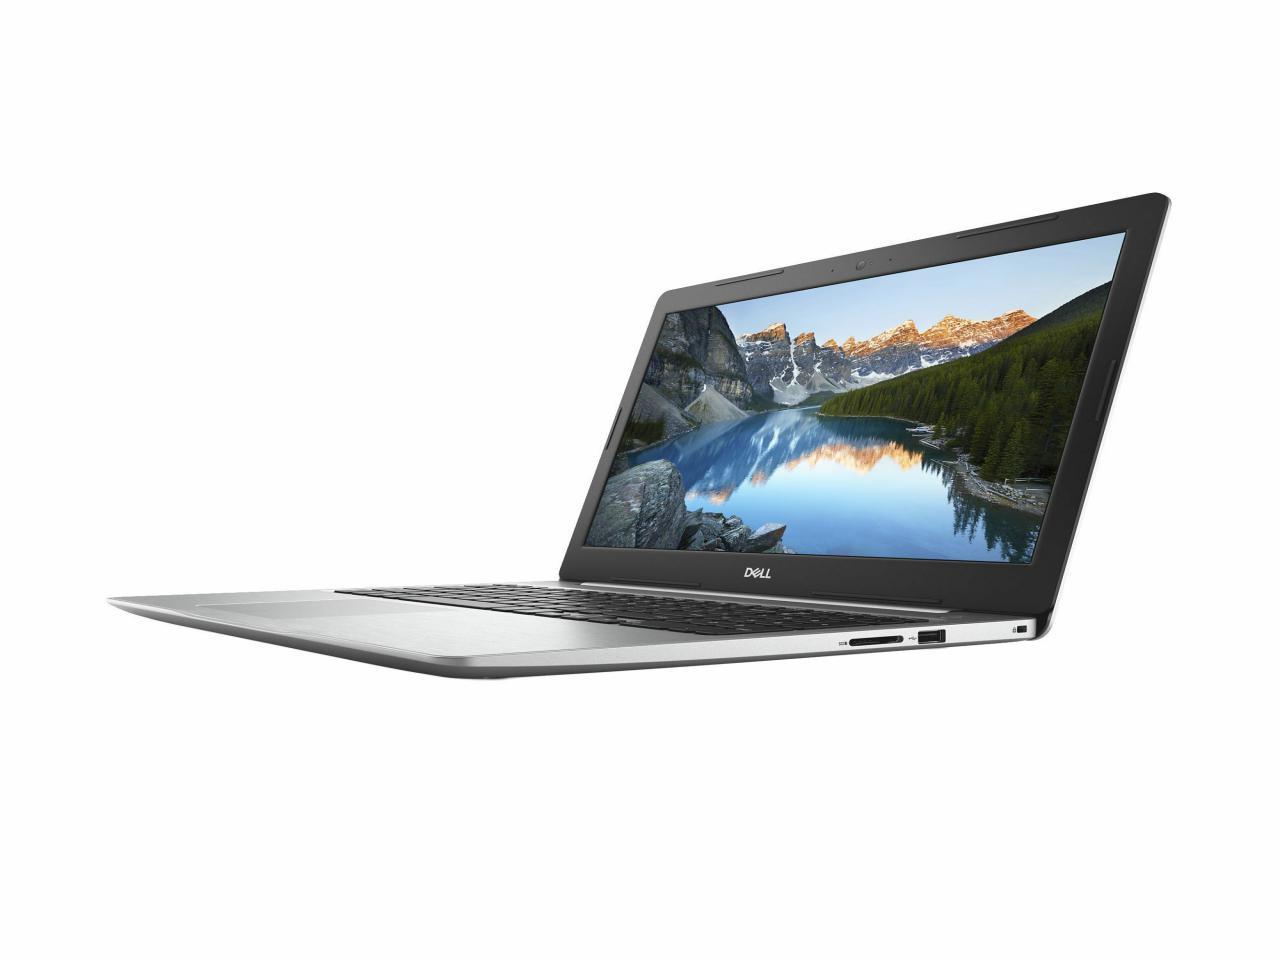 Dell Inspiron 15 (5570)  - shop.bb-net.de